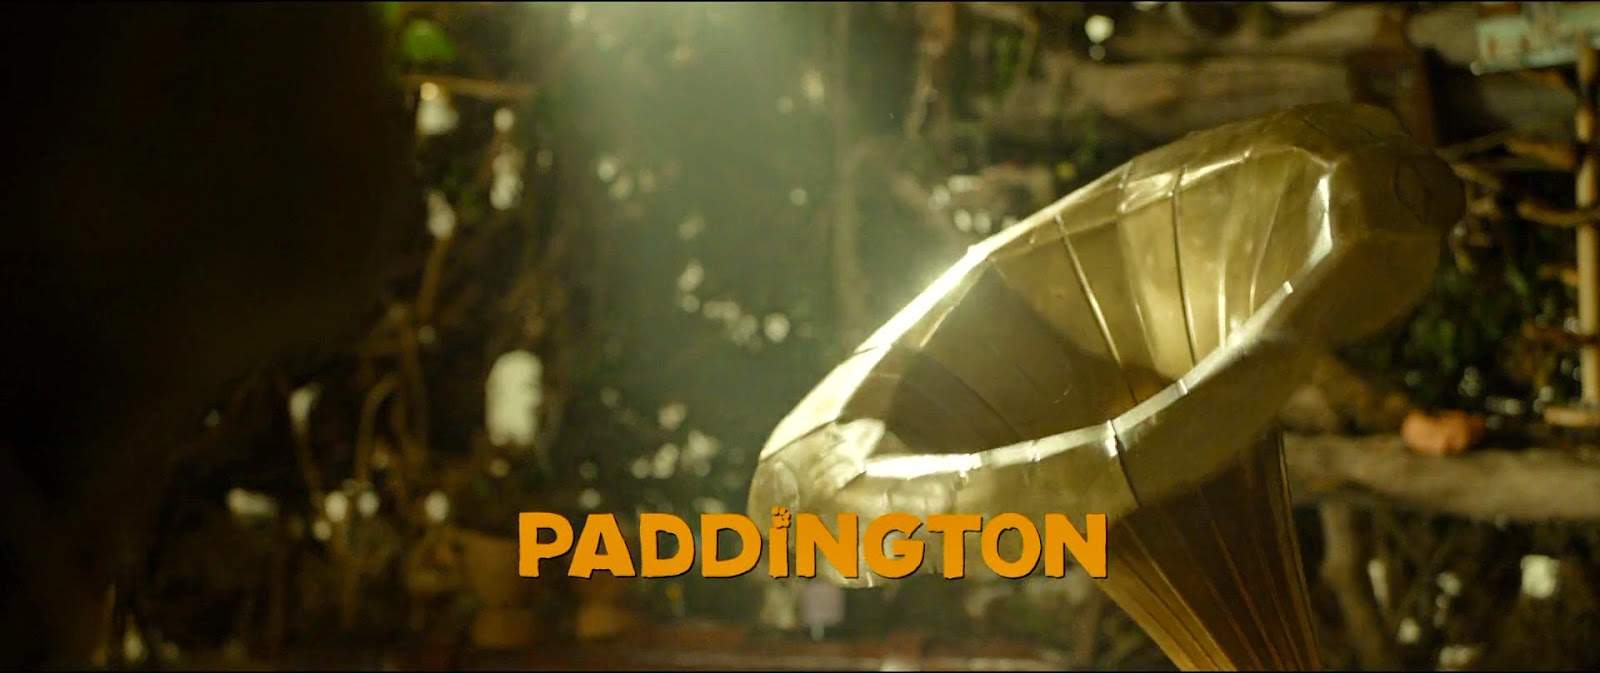 Paddington (2014) S2 s Paddington (2014)